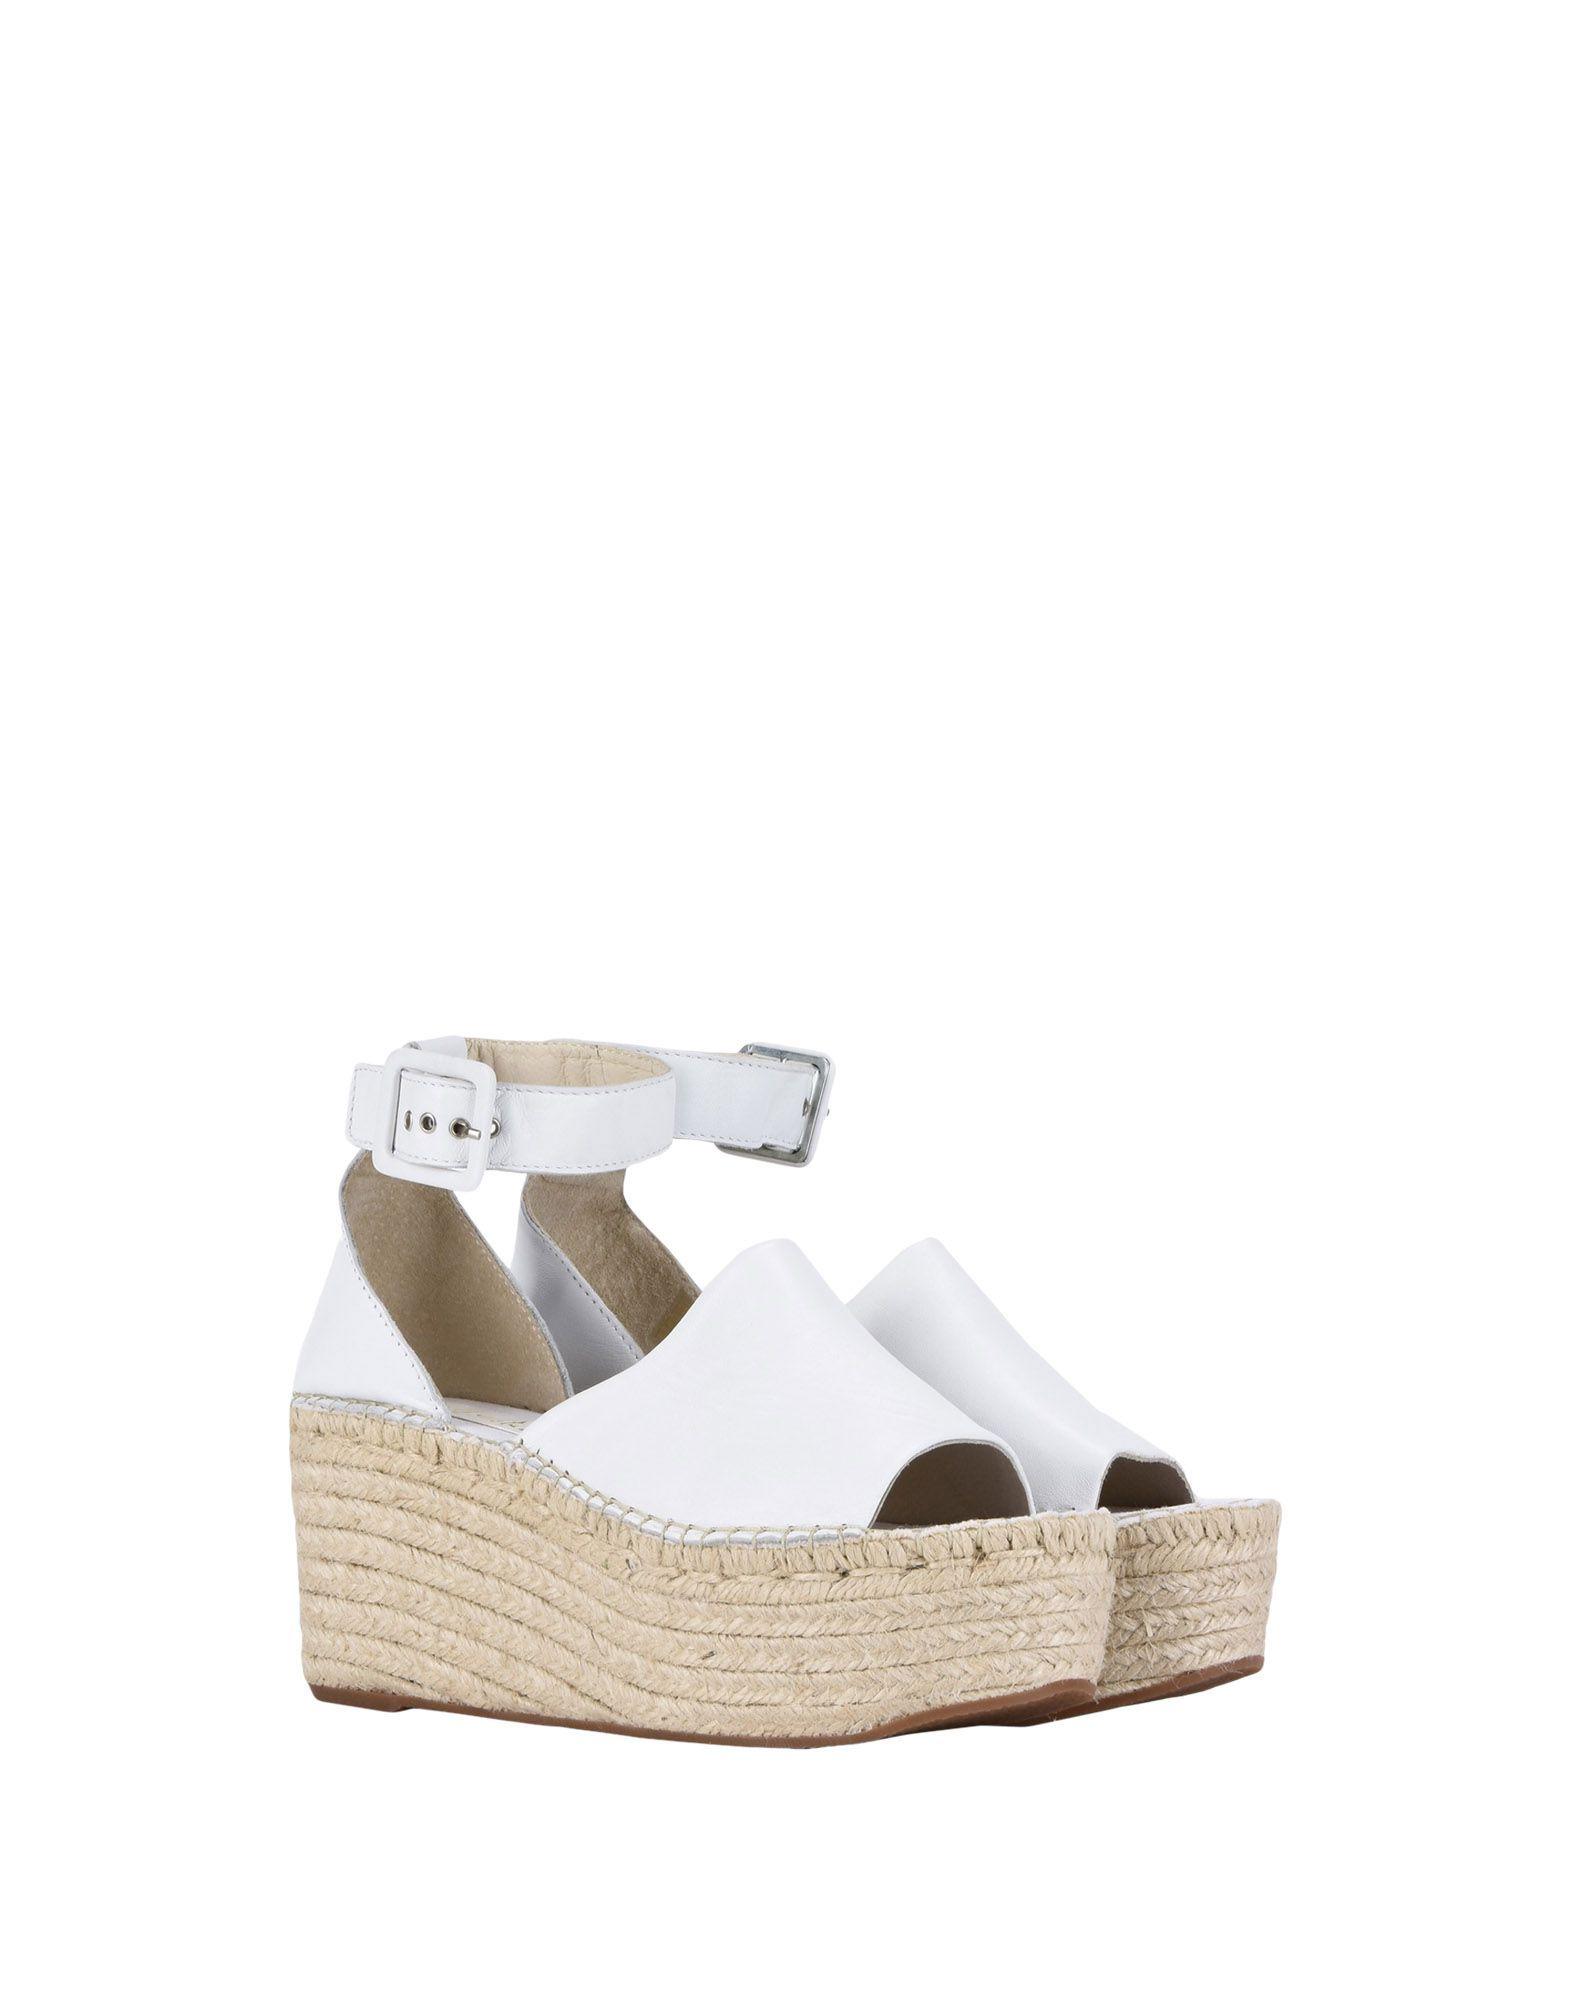 Gut um billige Schuhe Schuhe Schuhe zu tragenVidorreta Espadrilles Damen  11468678IX 125fd4